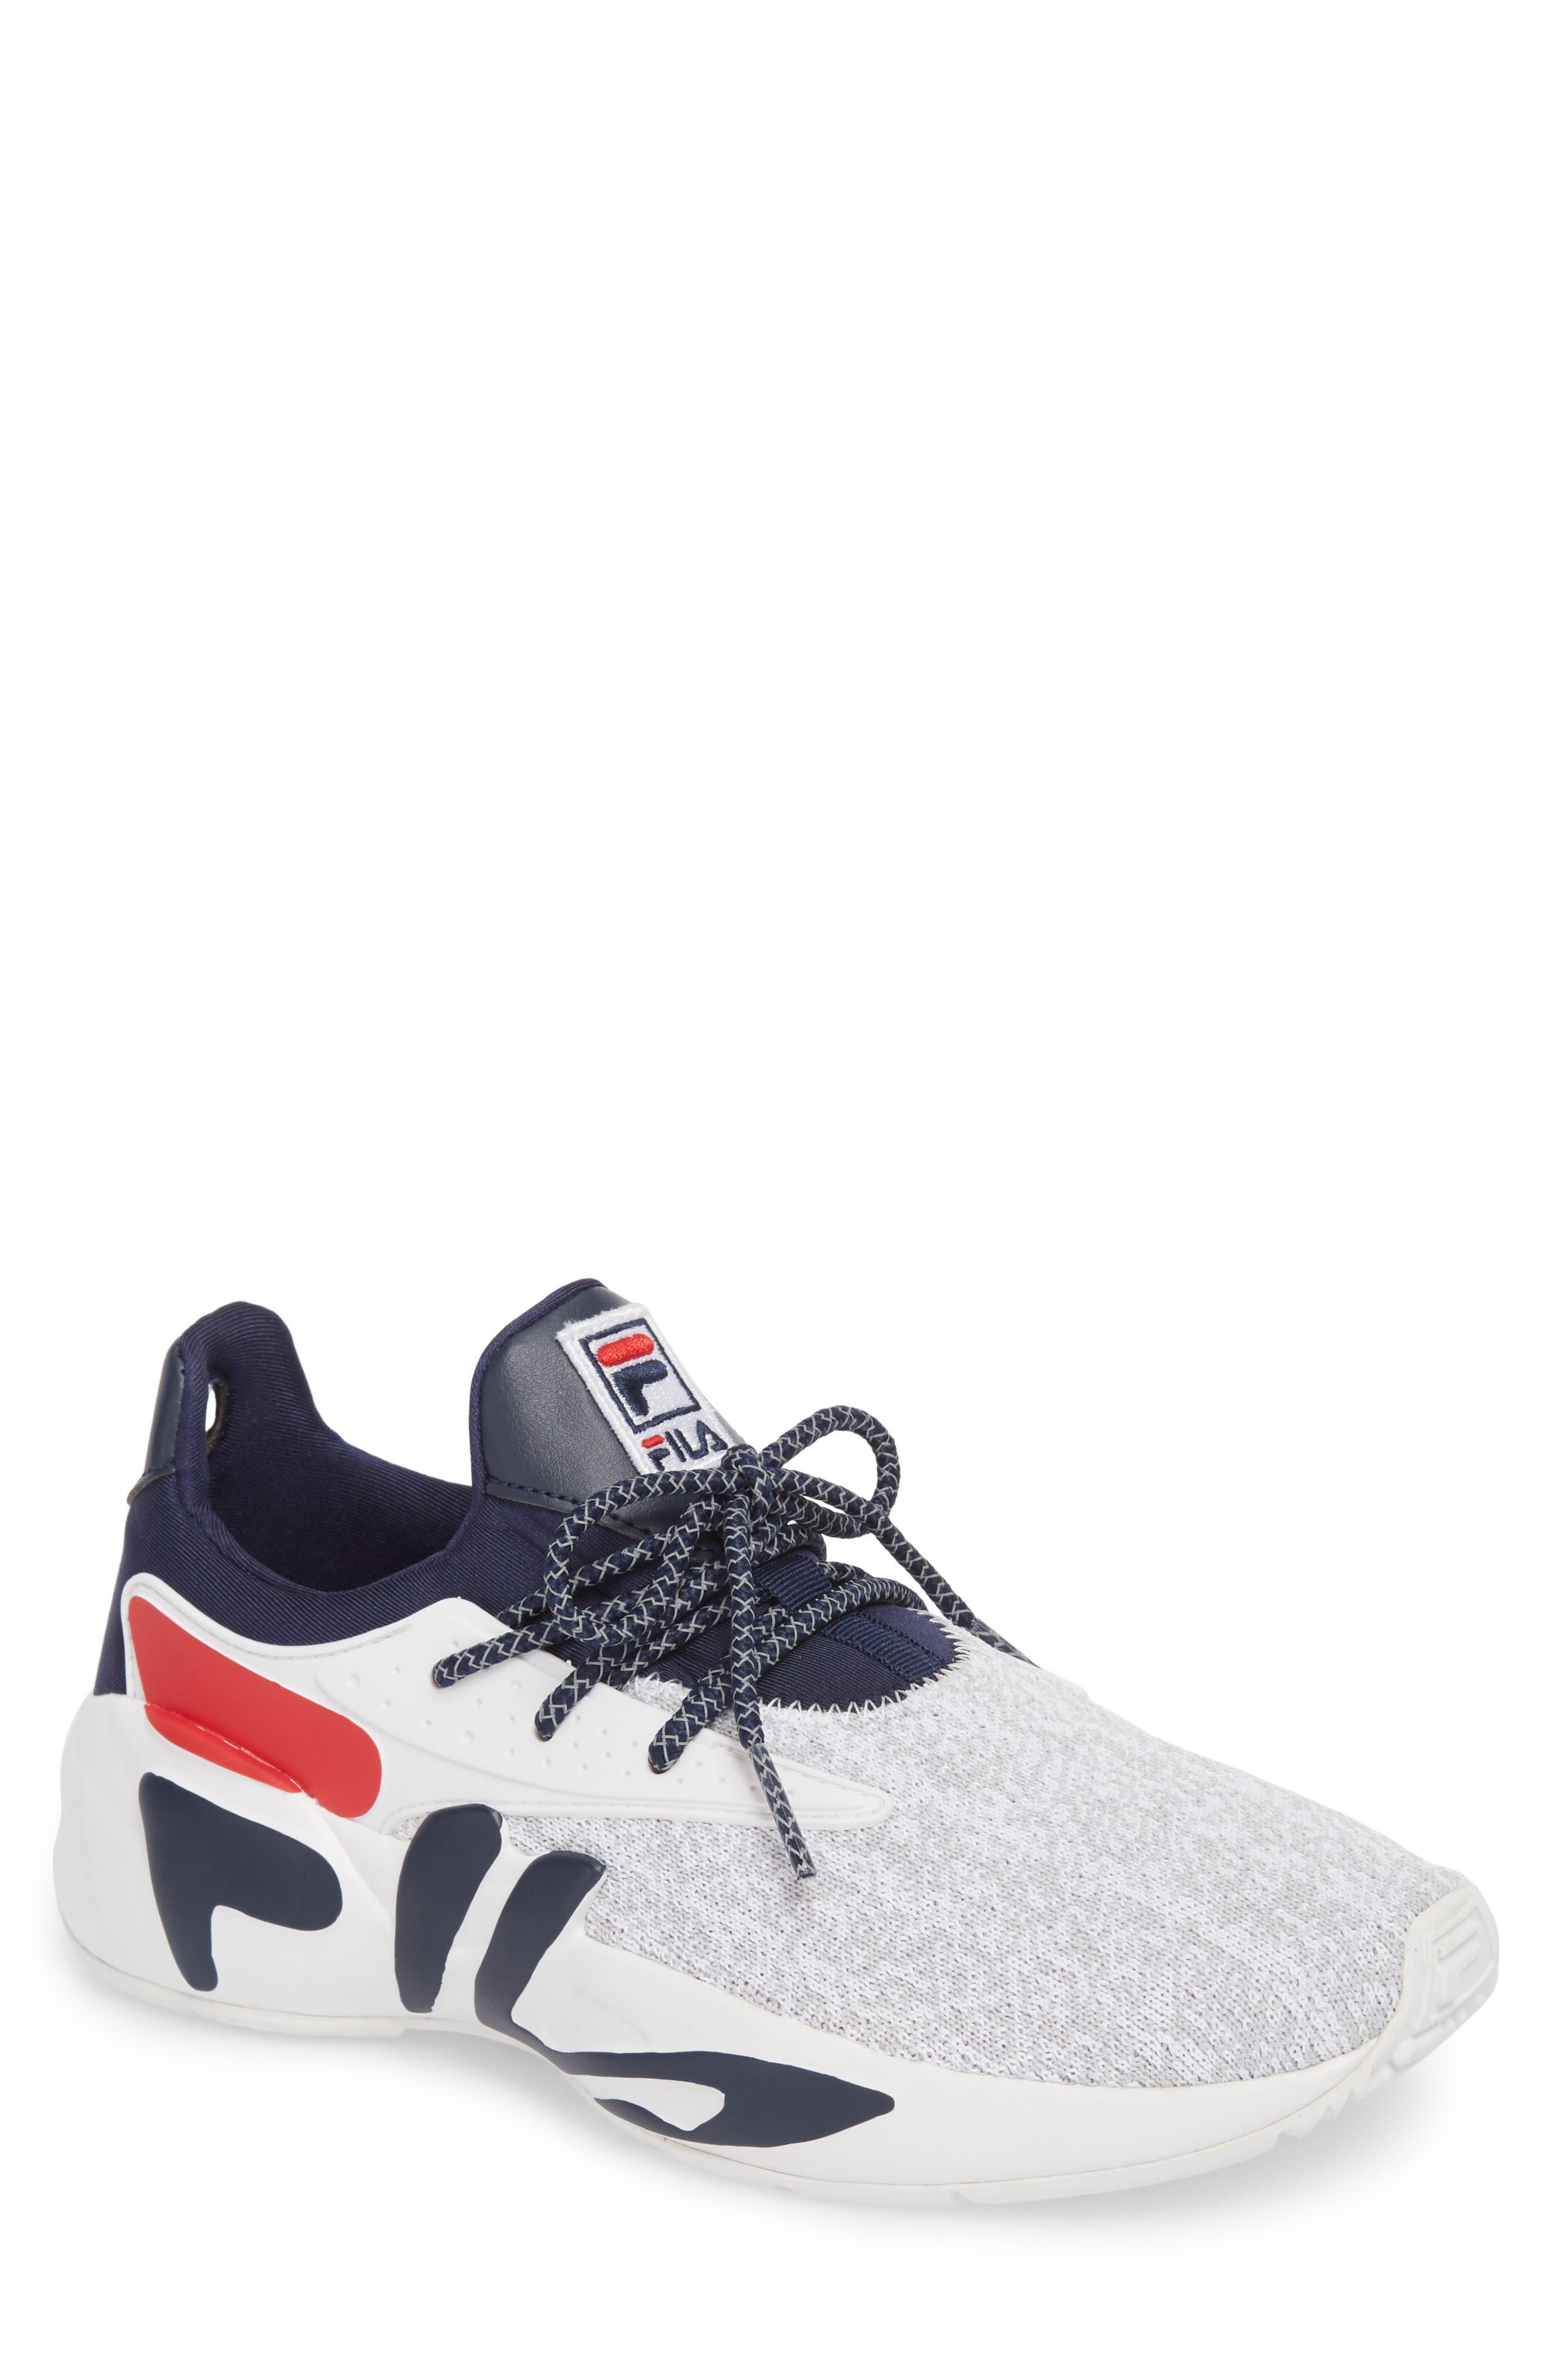 Mindbreaker 2.0 Sneaker,                             Main thumbnail 1, color,                             White/ Navy/ Red